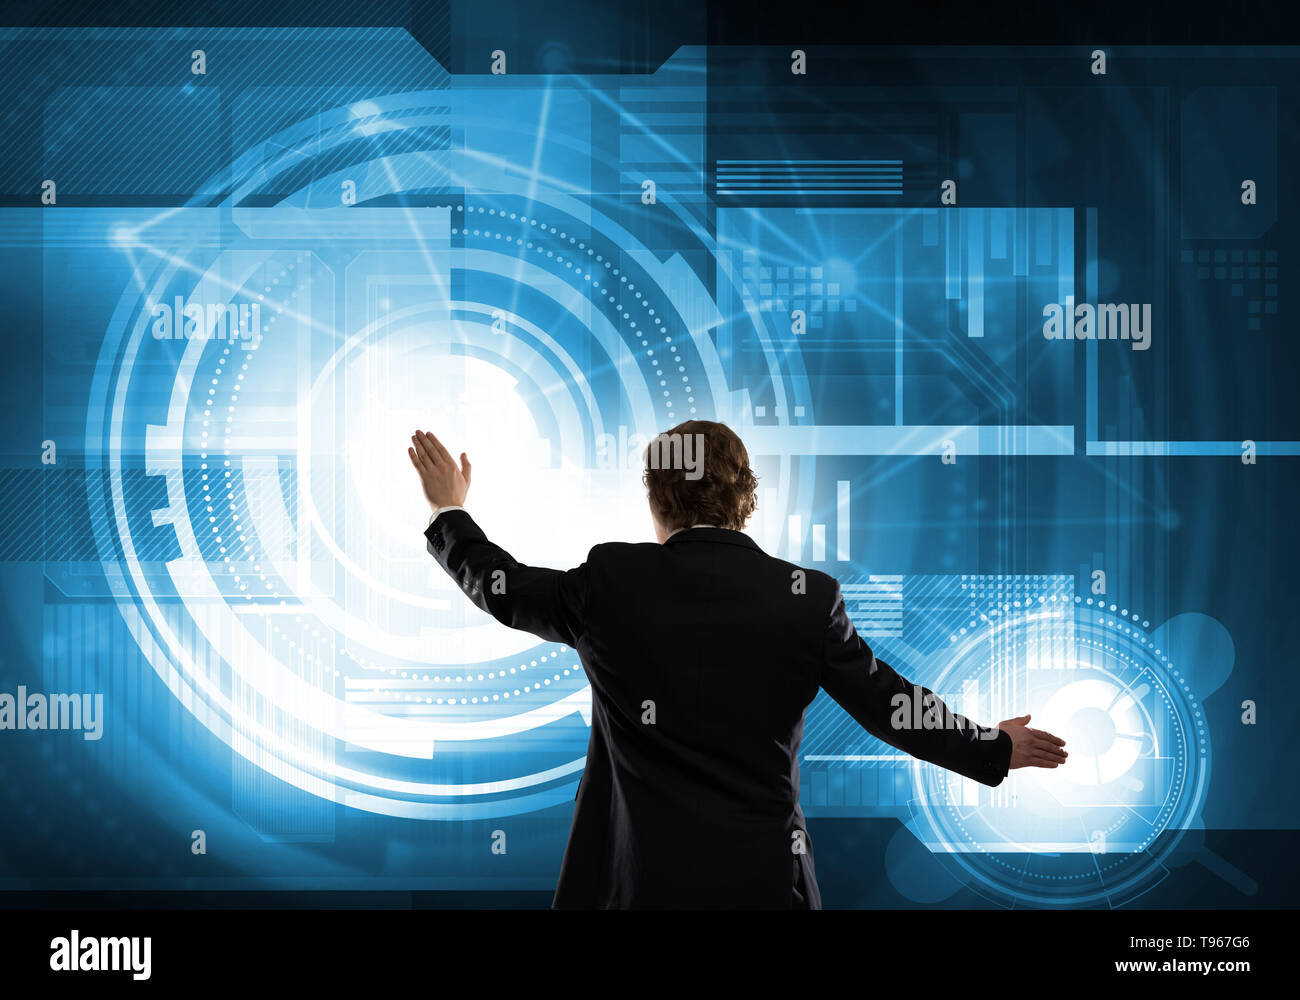 Innovative media technologies - Stock Image